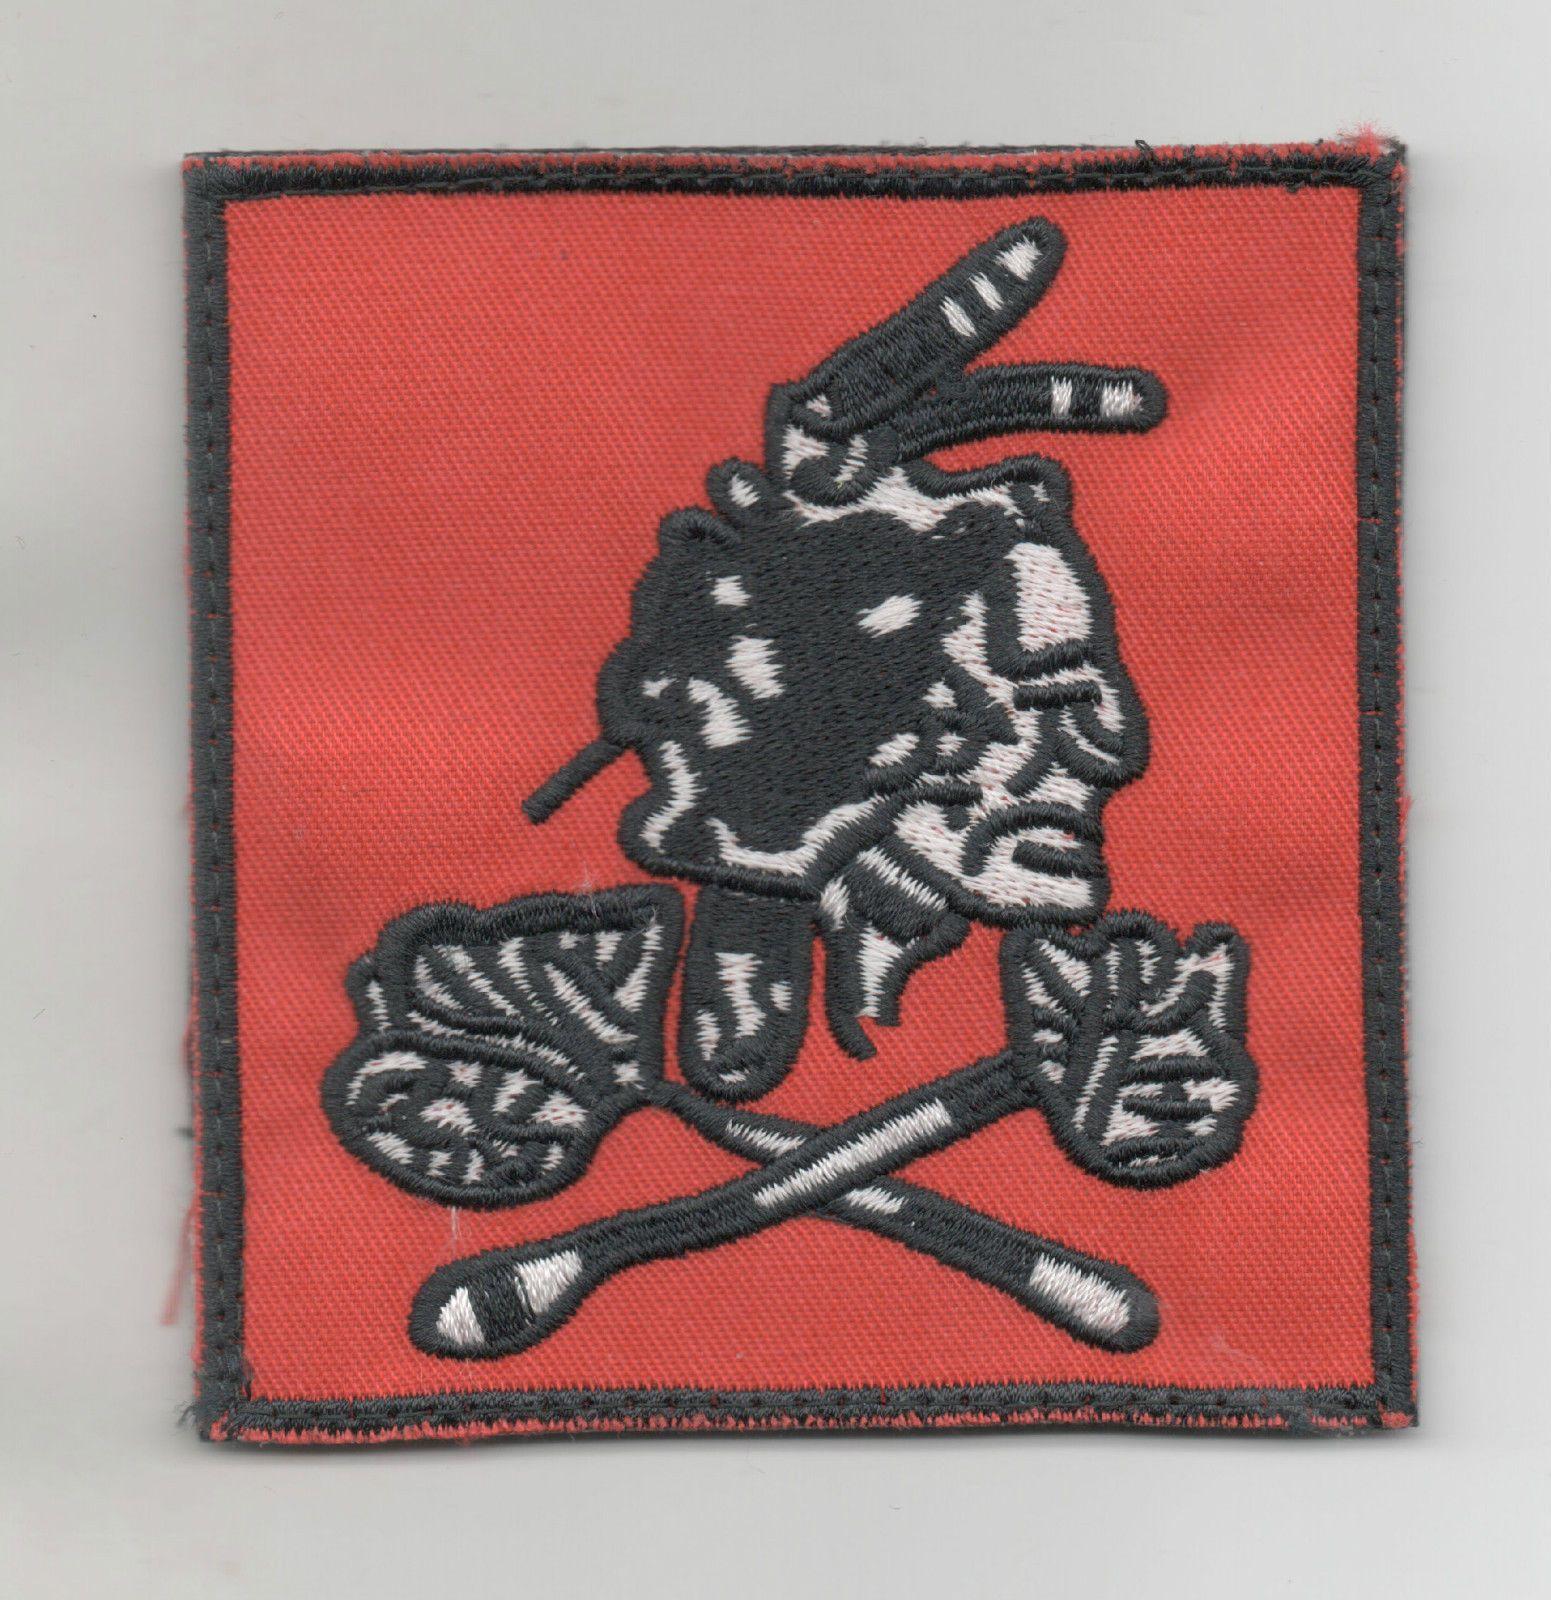 e9e206f7ceb US Navy SEAL Team 6 DEVGRU the Tribe Red Squadron patch